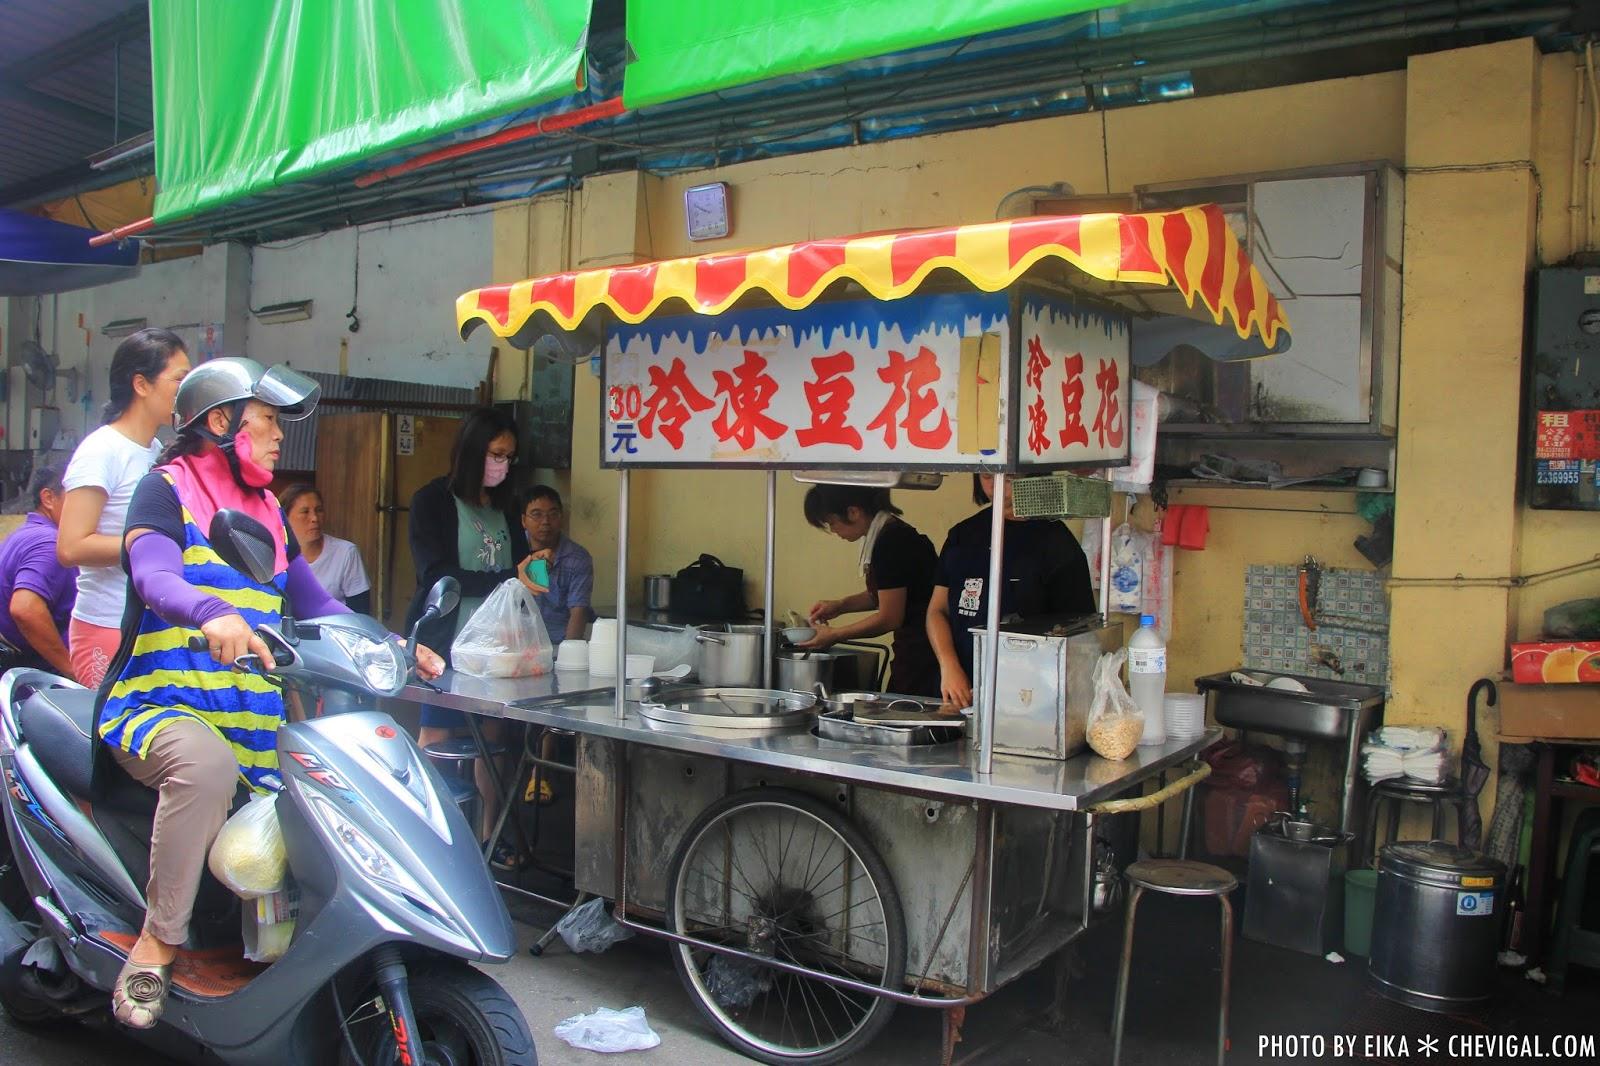 IMG 0028 - 台中烏日│阿月豆花店。伴隨烏日人成長的好味道。冷暖陪你度過一年四季